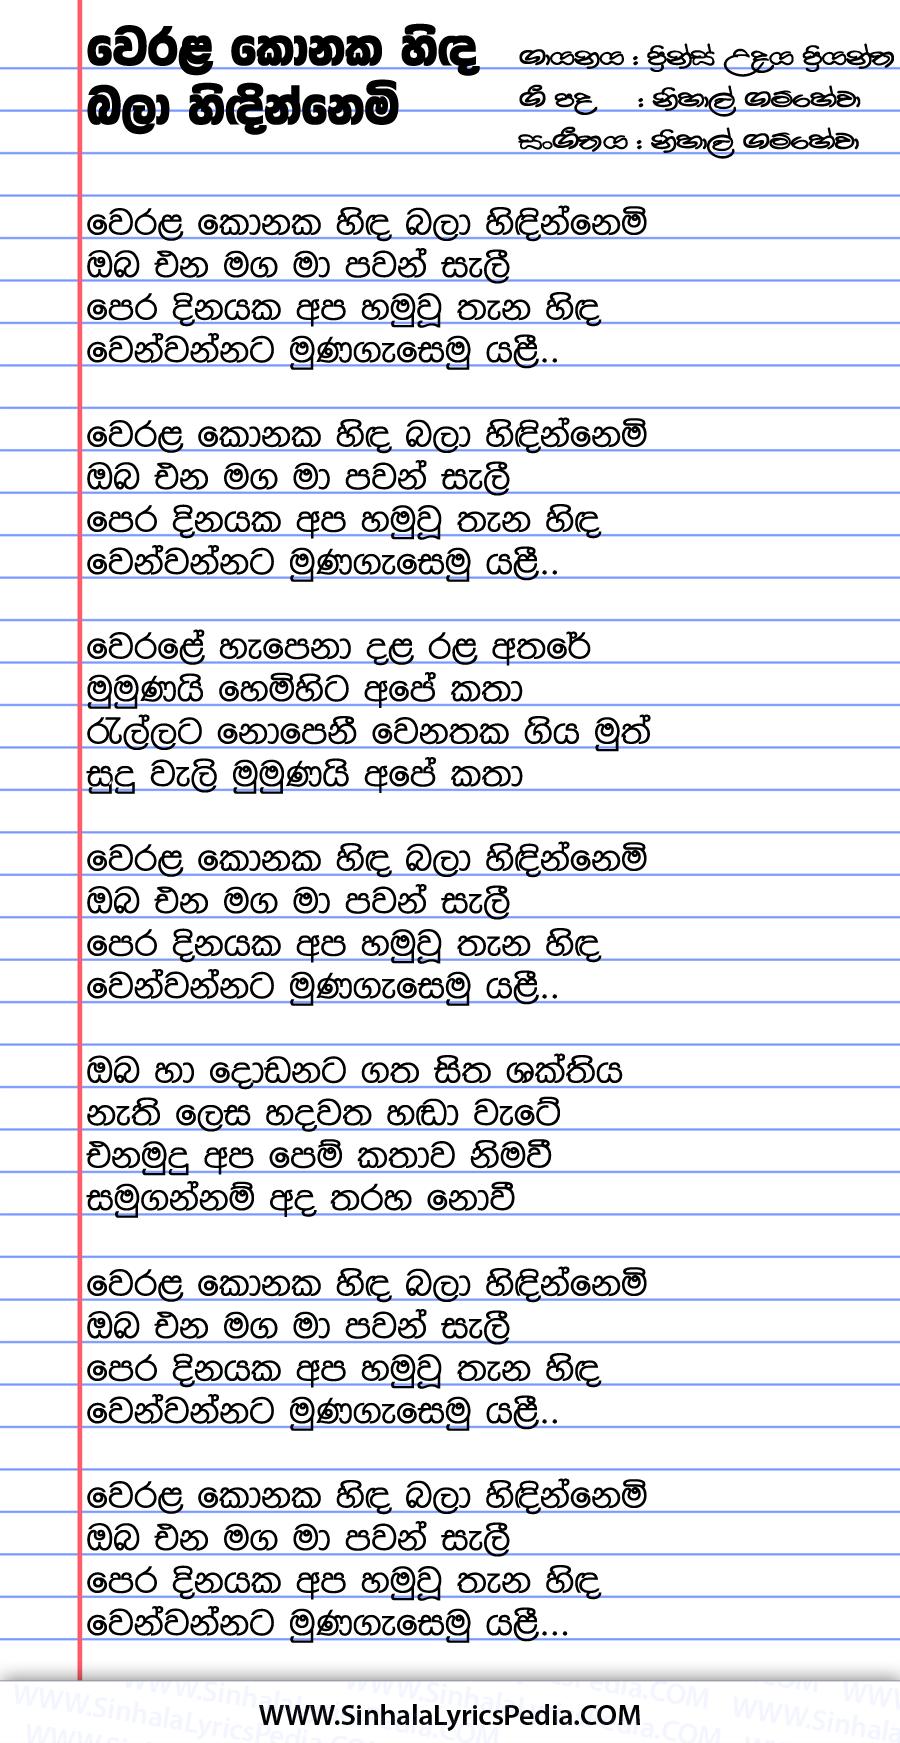 Werala Konaka Hinda Bala Hidinnemi Song Lyrics